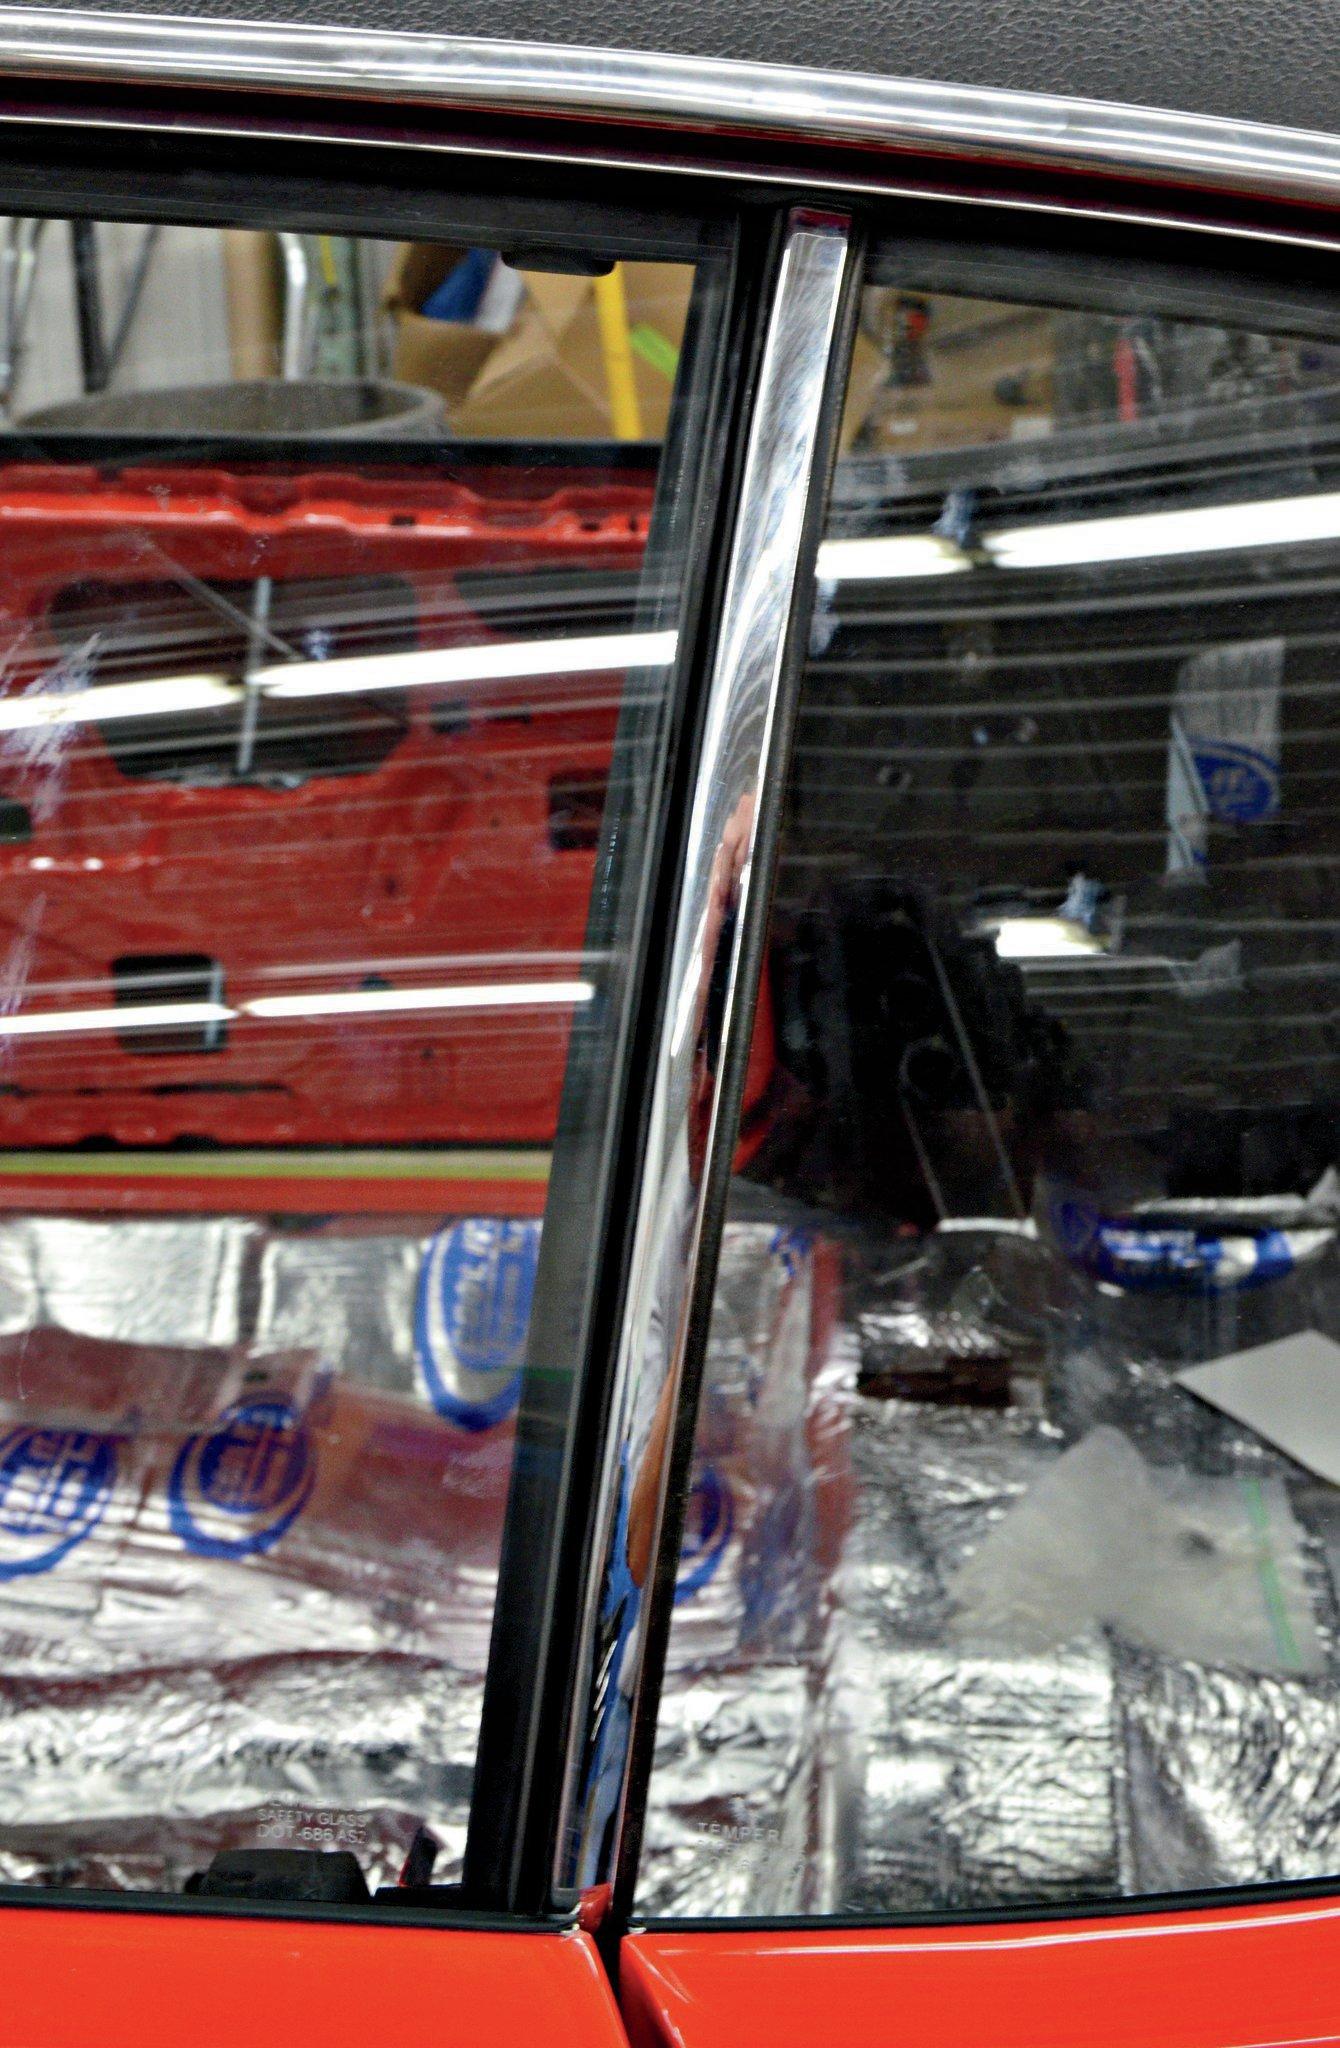 1970 Chevy Chevelle Basket Case Chevelle Part 4 Hot